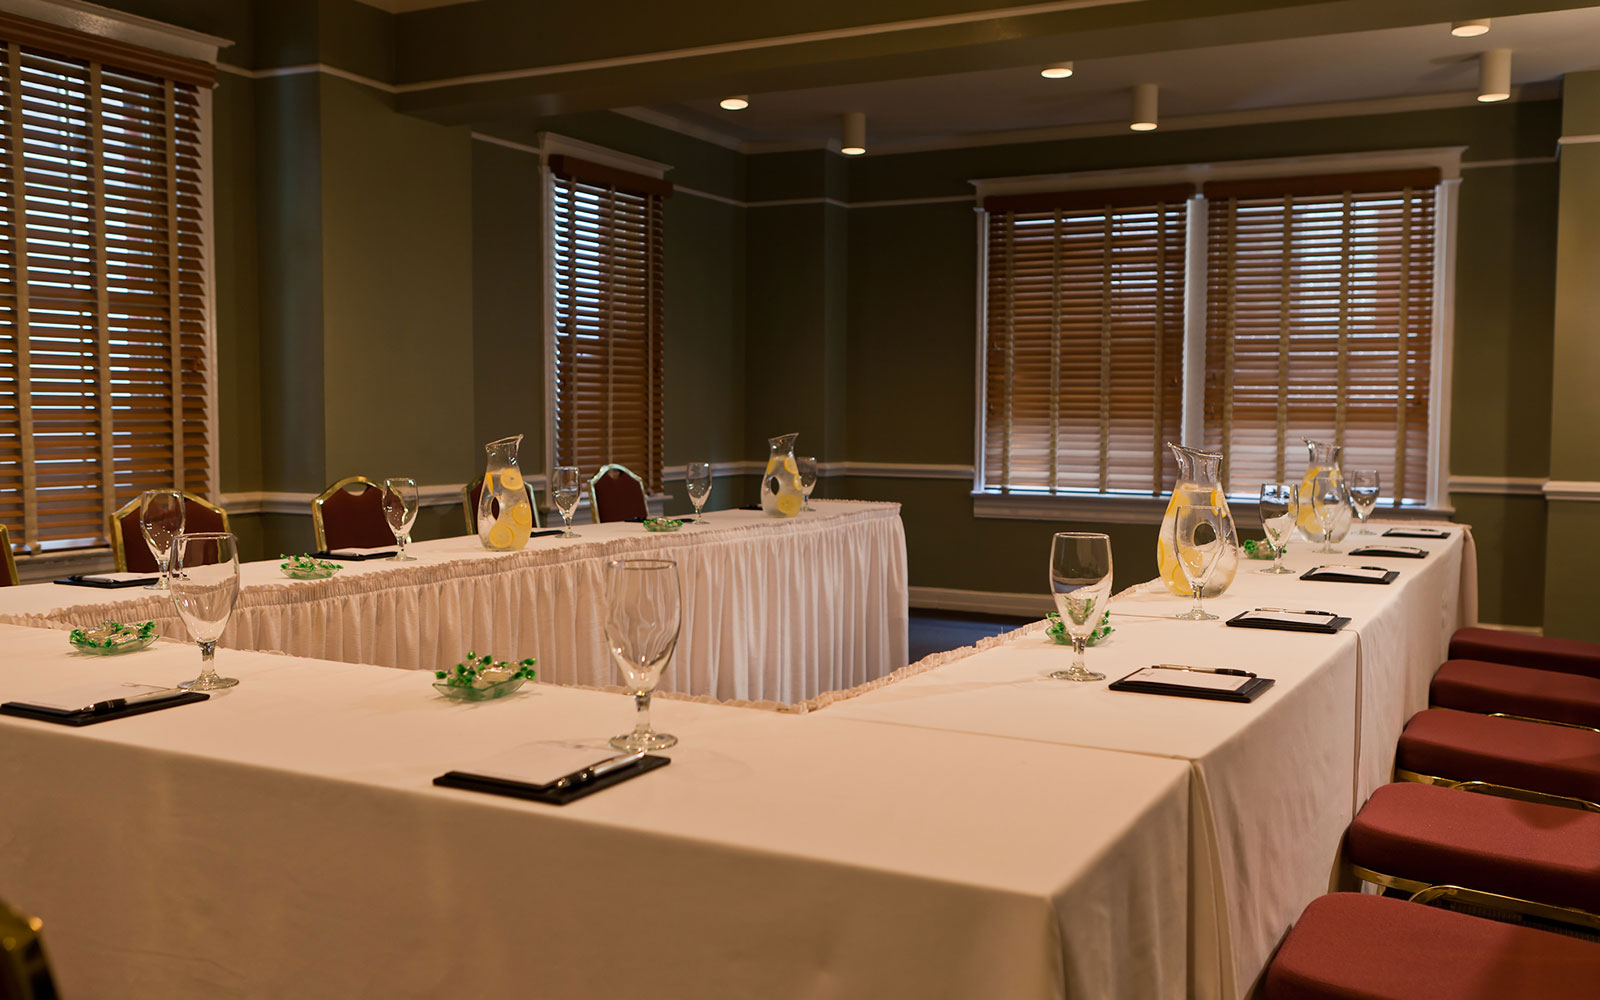 Meetings & Events Area of Hotel Lombardy, Washington